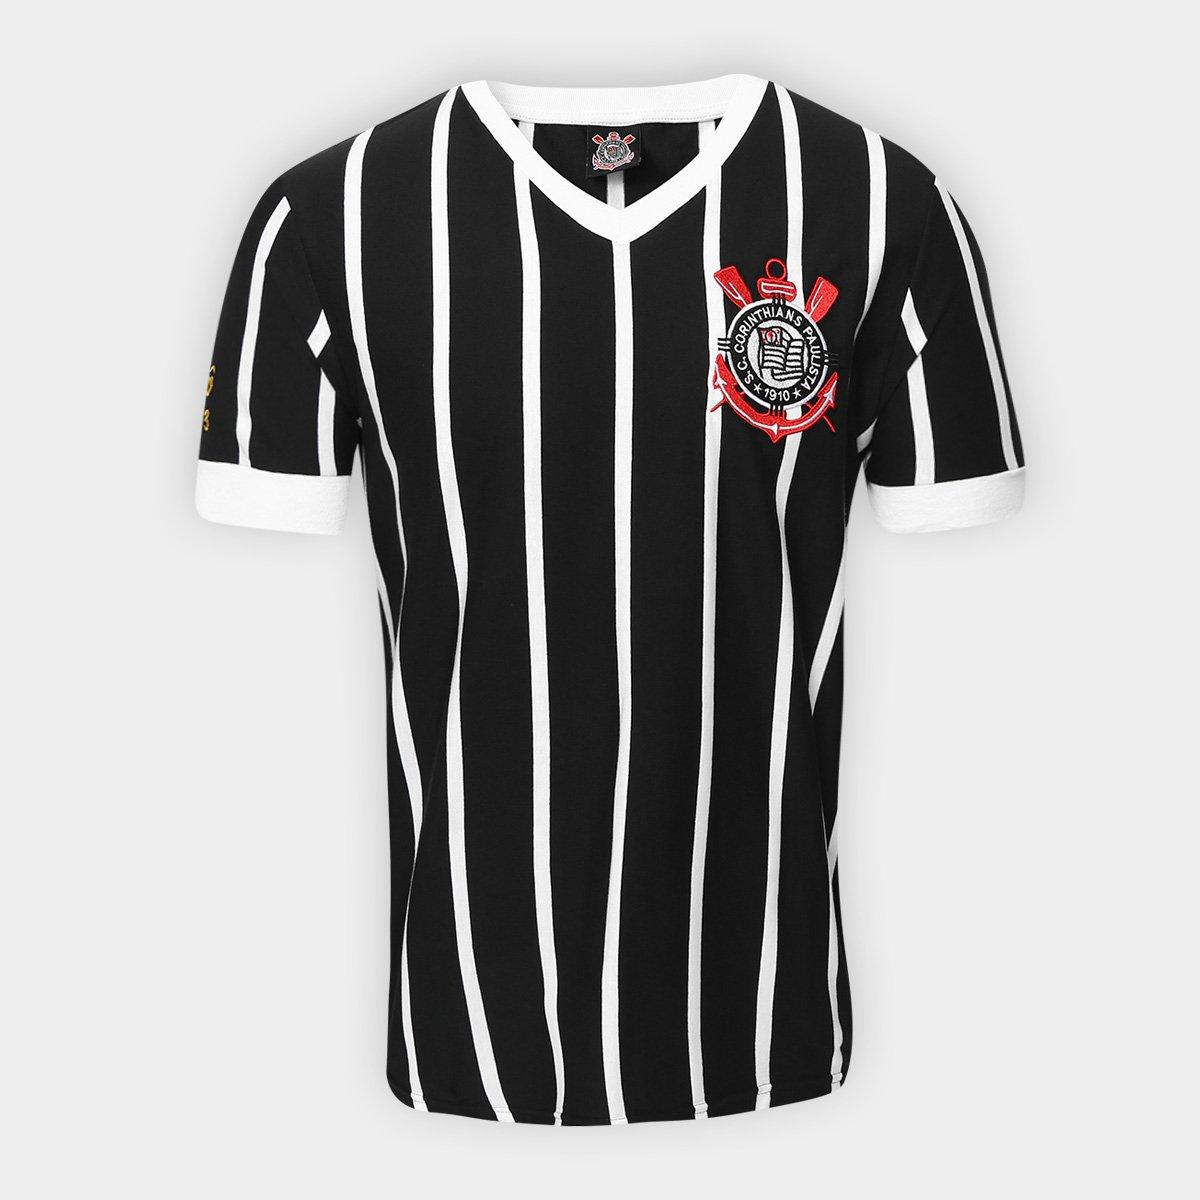 Camiseta Corinthians Réplica 1983 Masculina - Preto e Branco ... ffe5bae1a7539